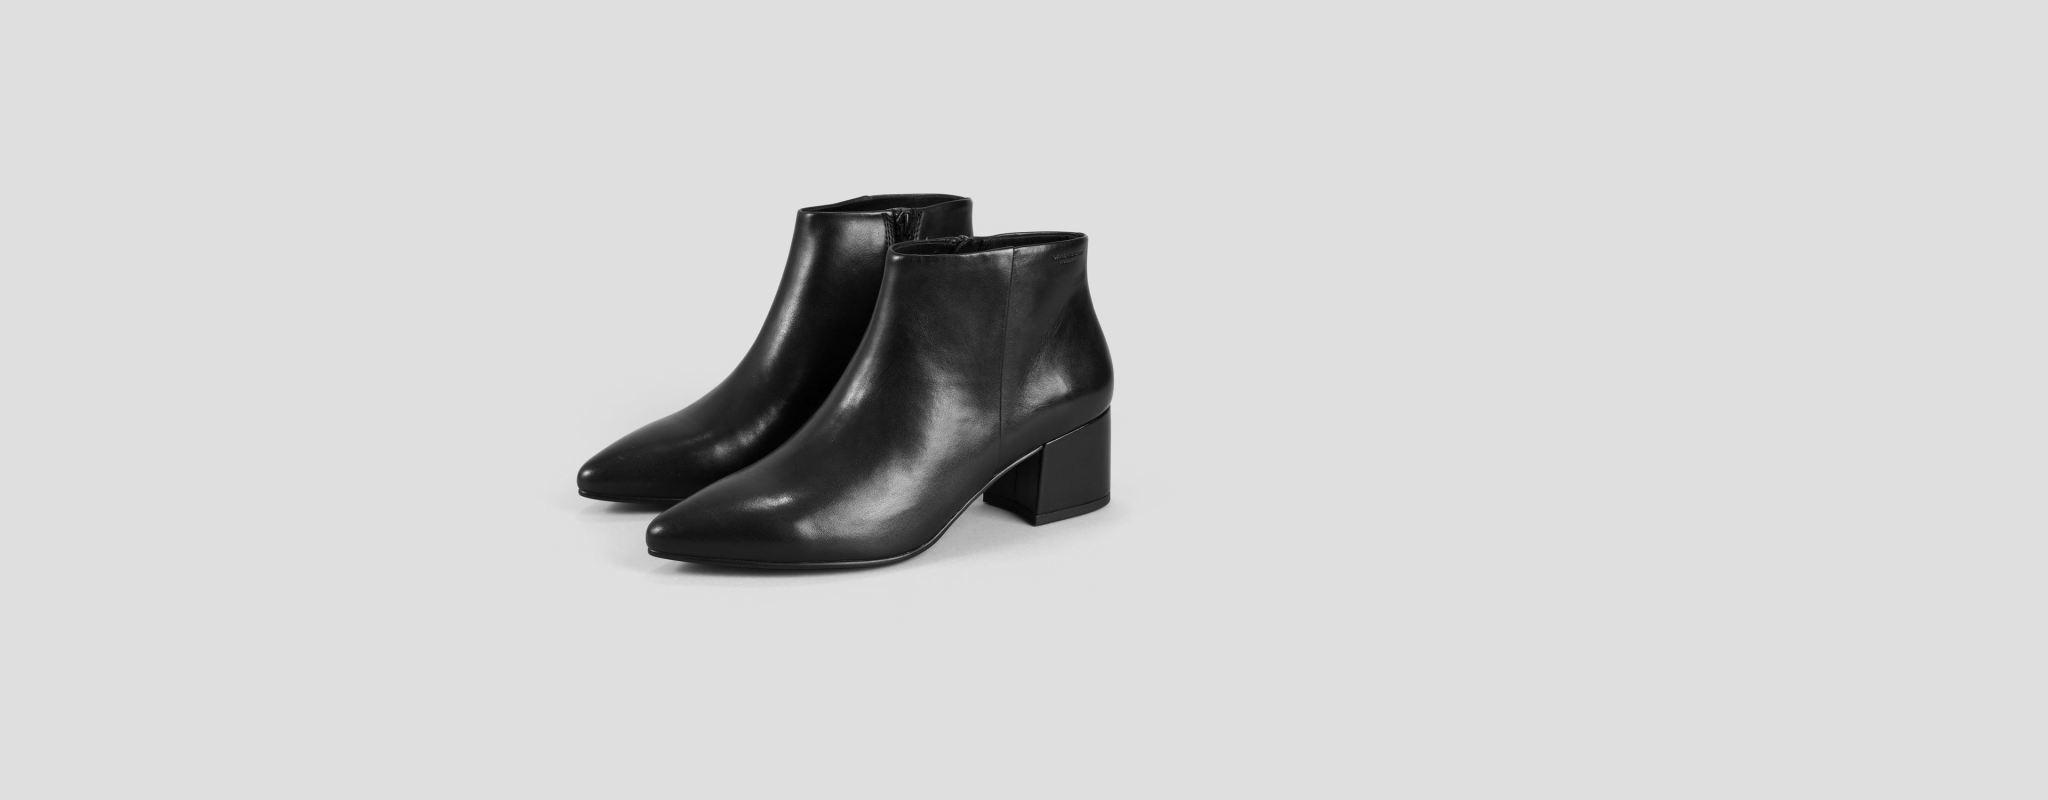 Mya Half High Black Leather Boots-1